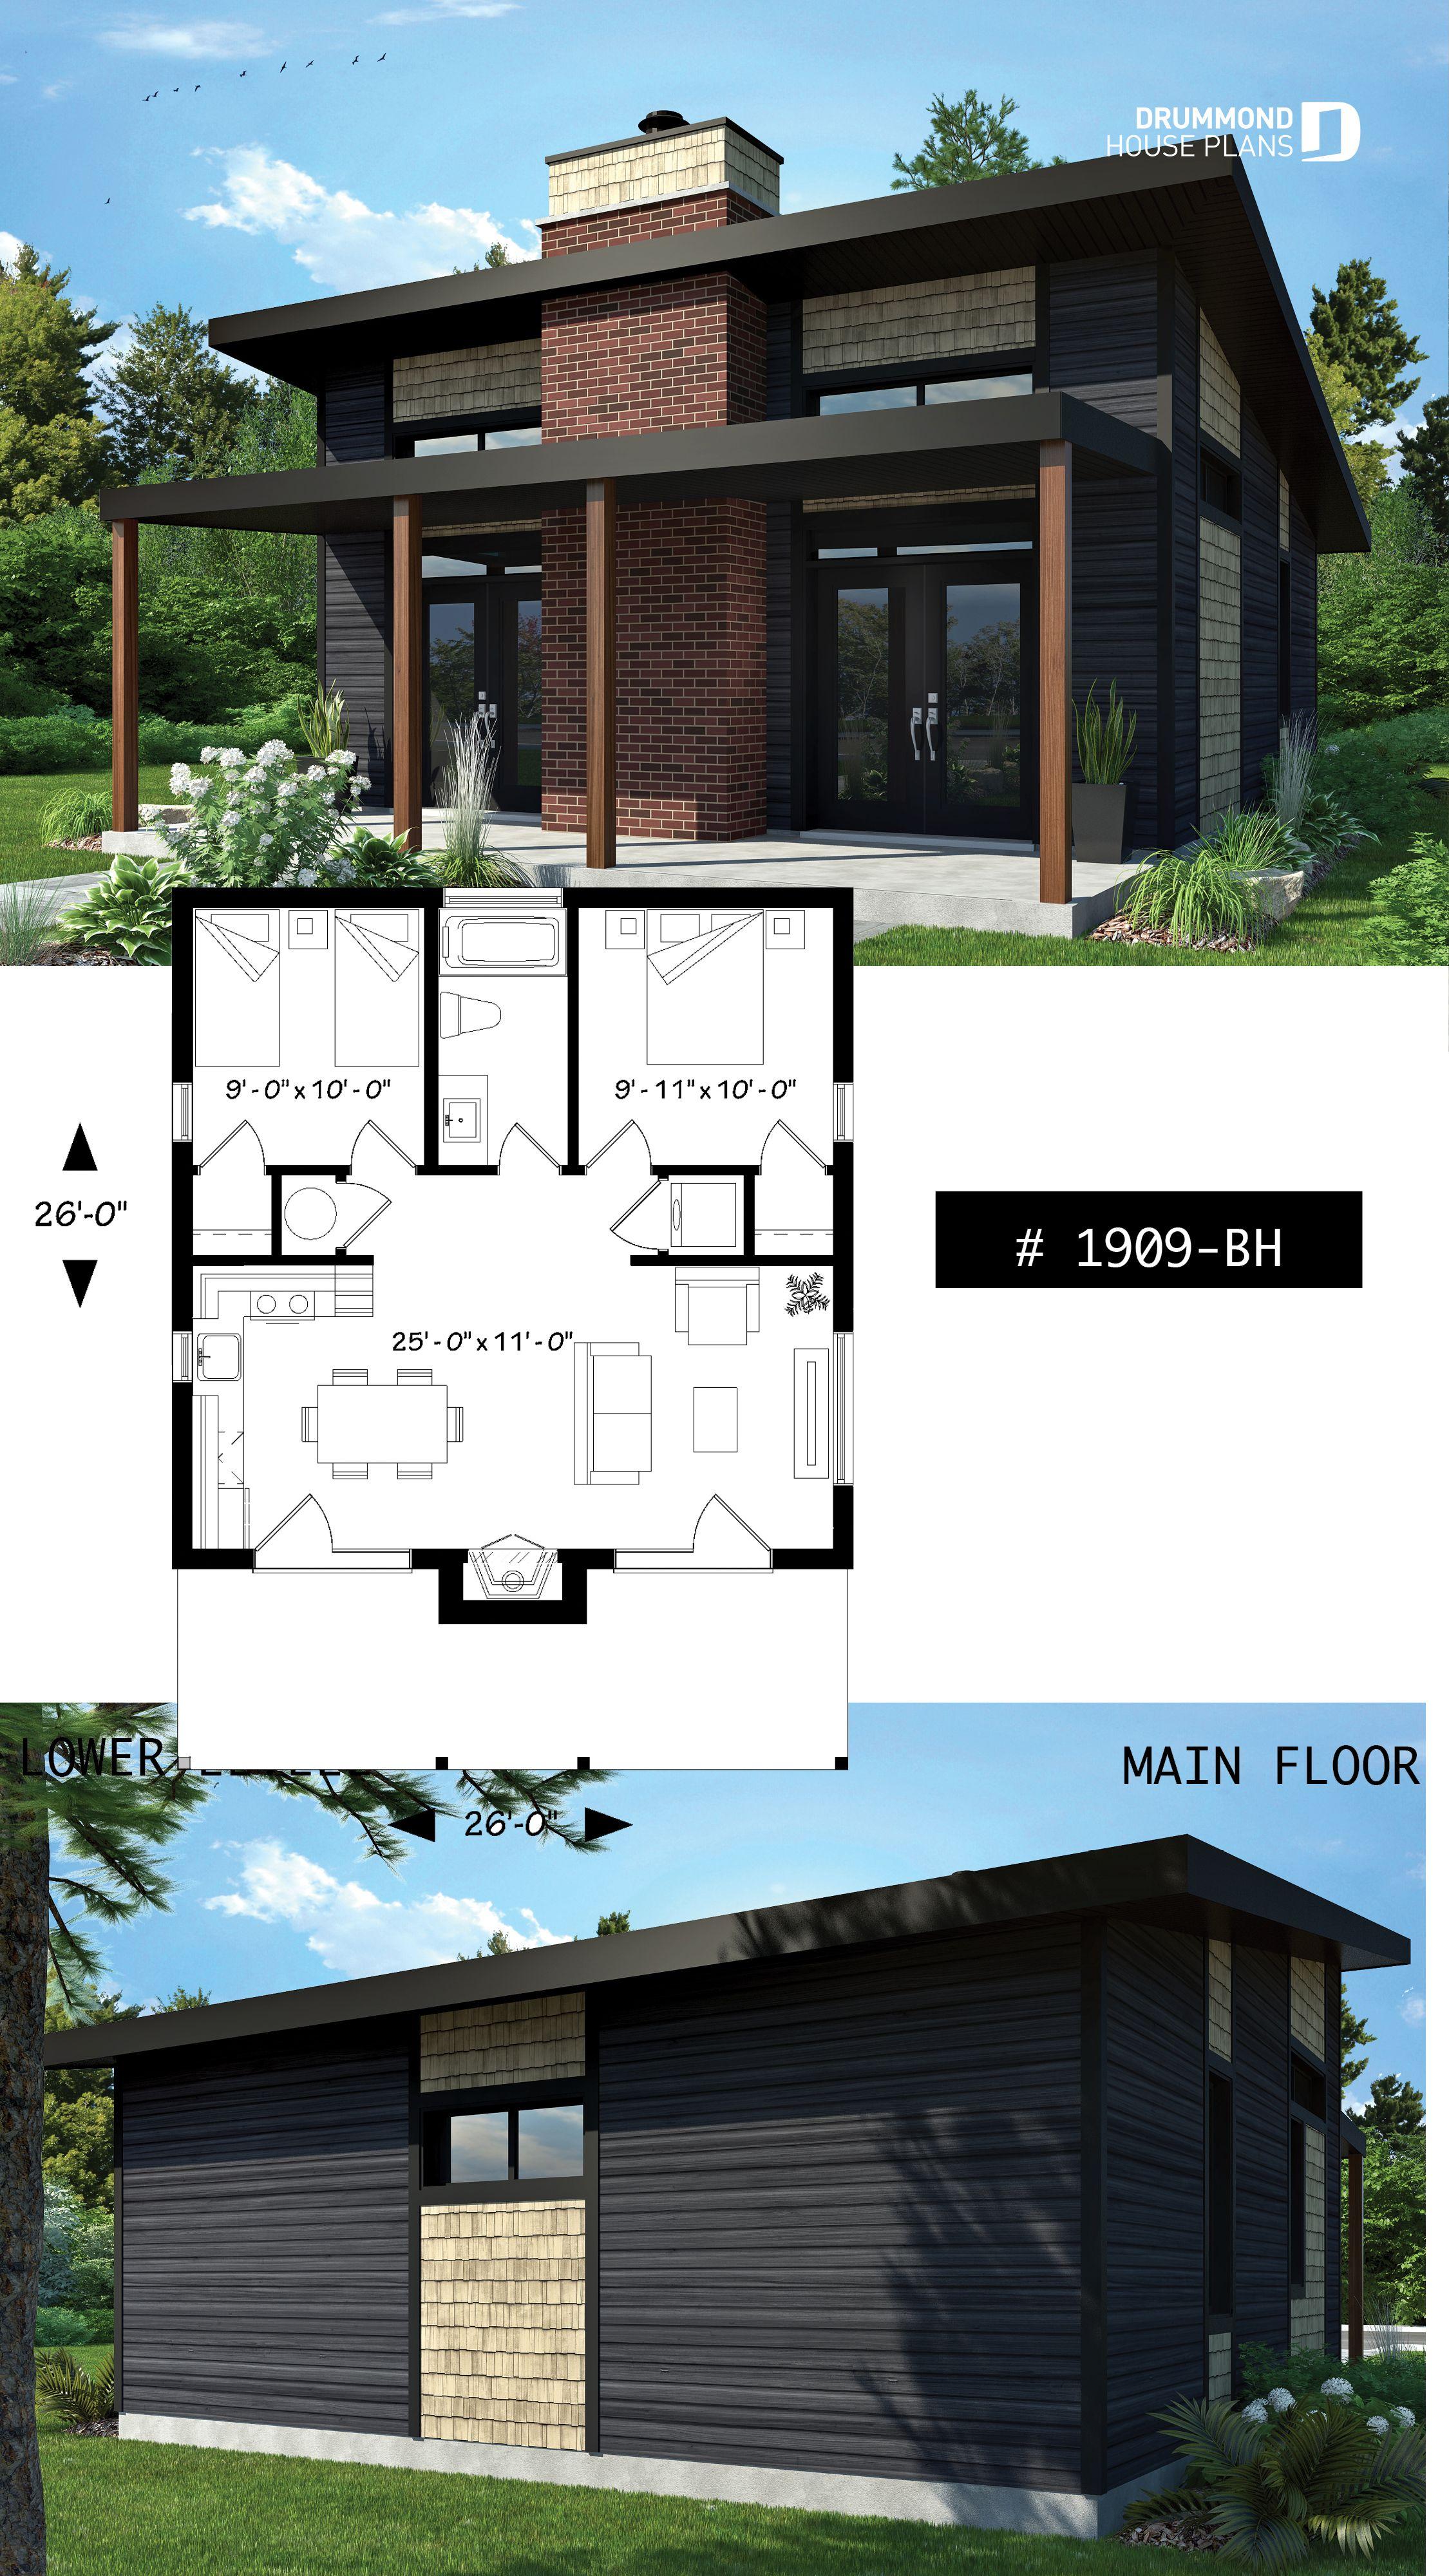 House Plan Bonzai No 1909 Bh Small Modern Cabin Modern